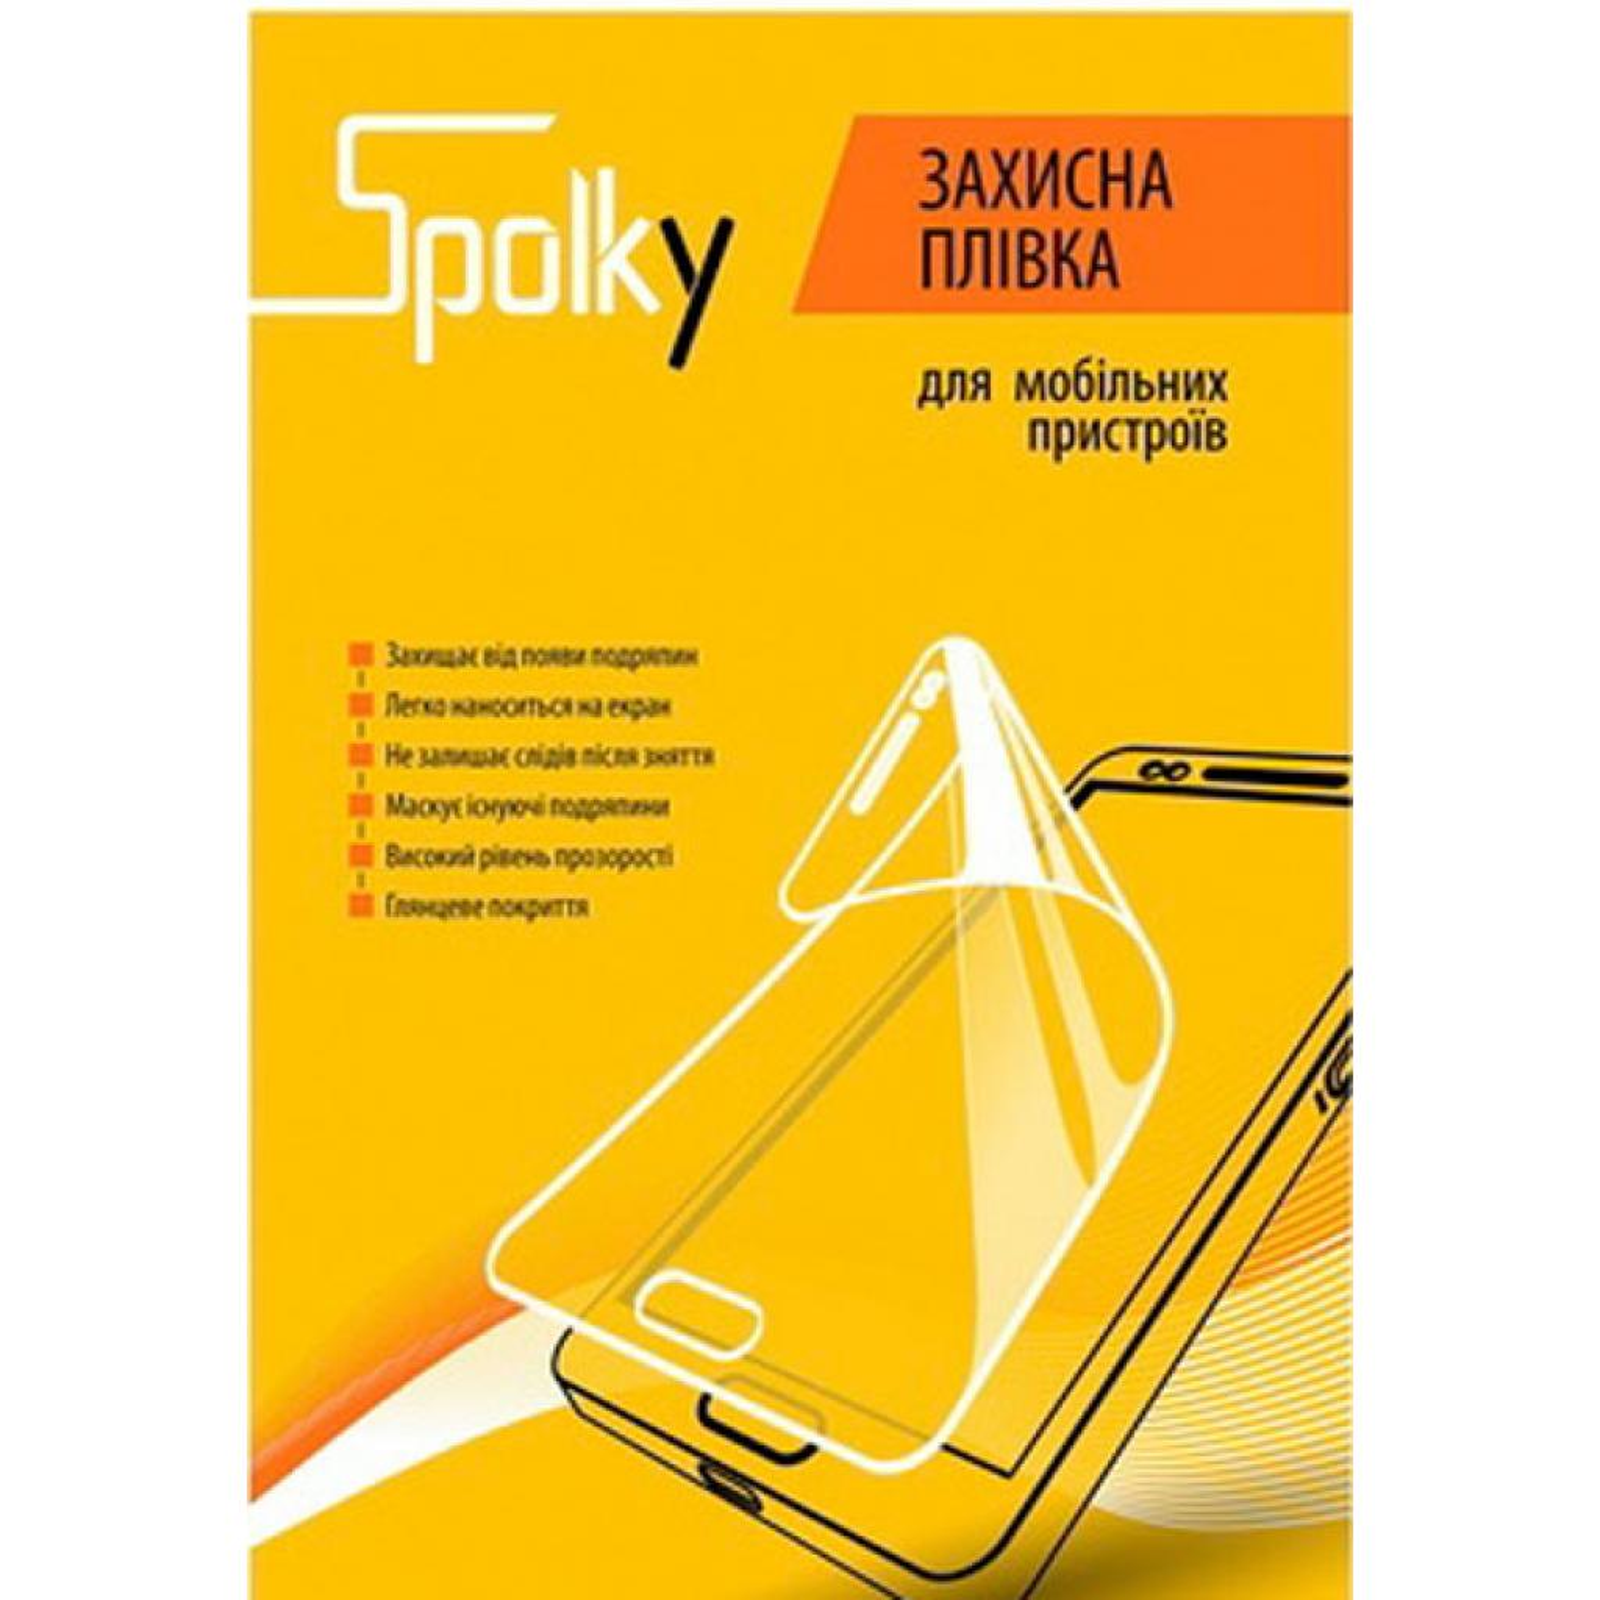 Пленка защитная Spolky для Microsoft Lumia 640 XL (Nokia) DS (336312)